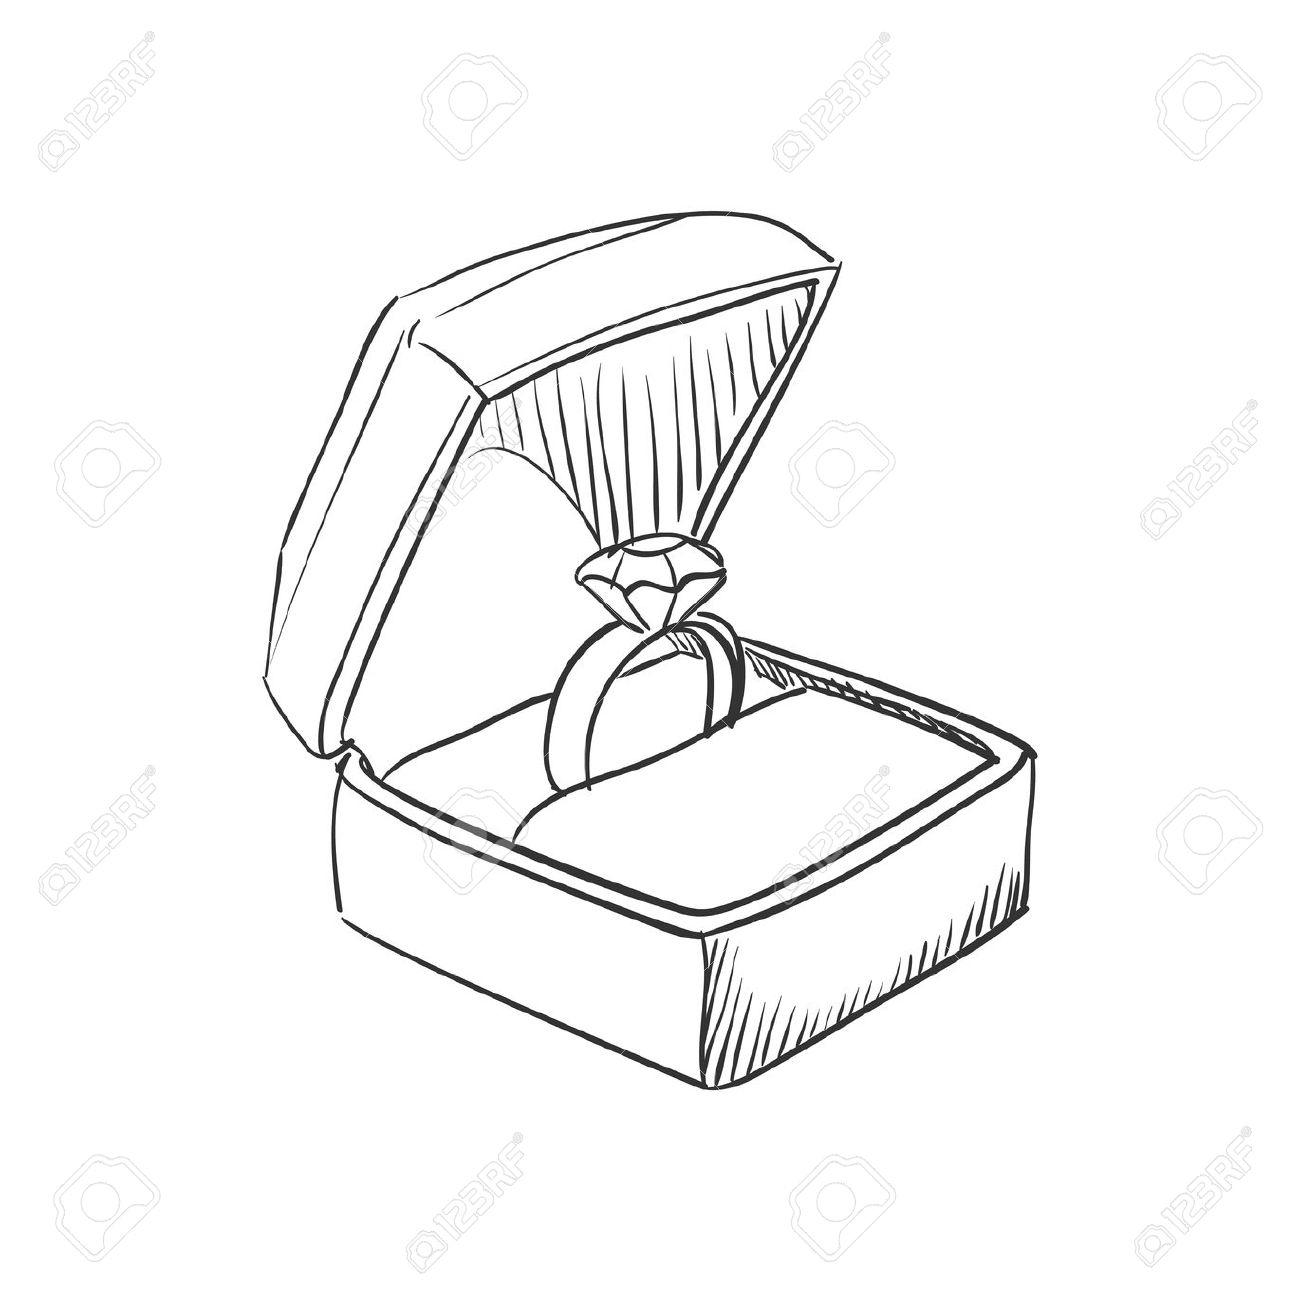 Diamond Pencil Drawing At Getdrawings